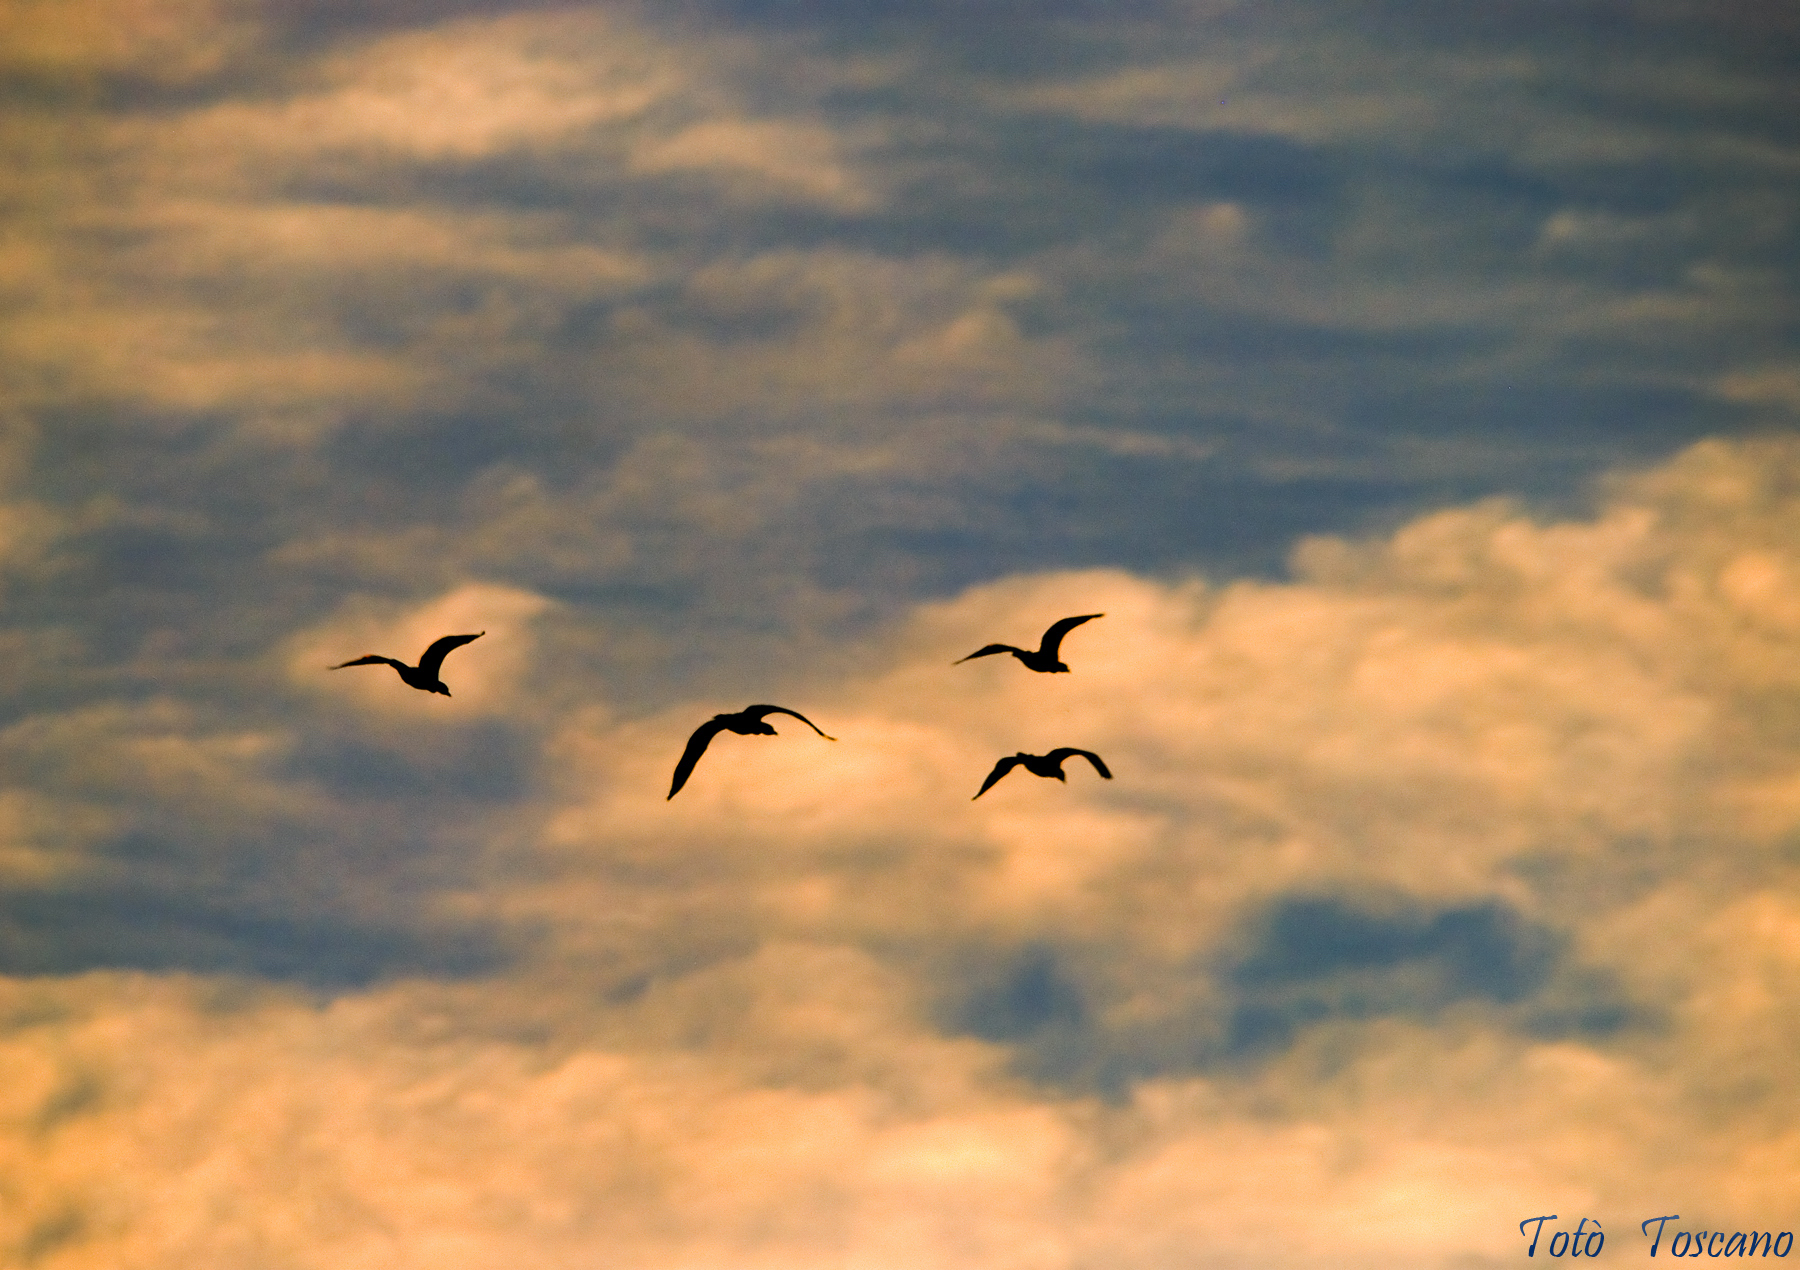 Verso cieli nuovi...